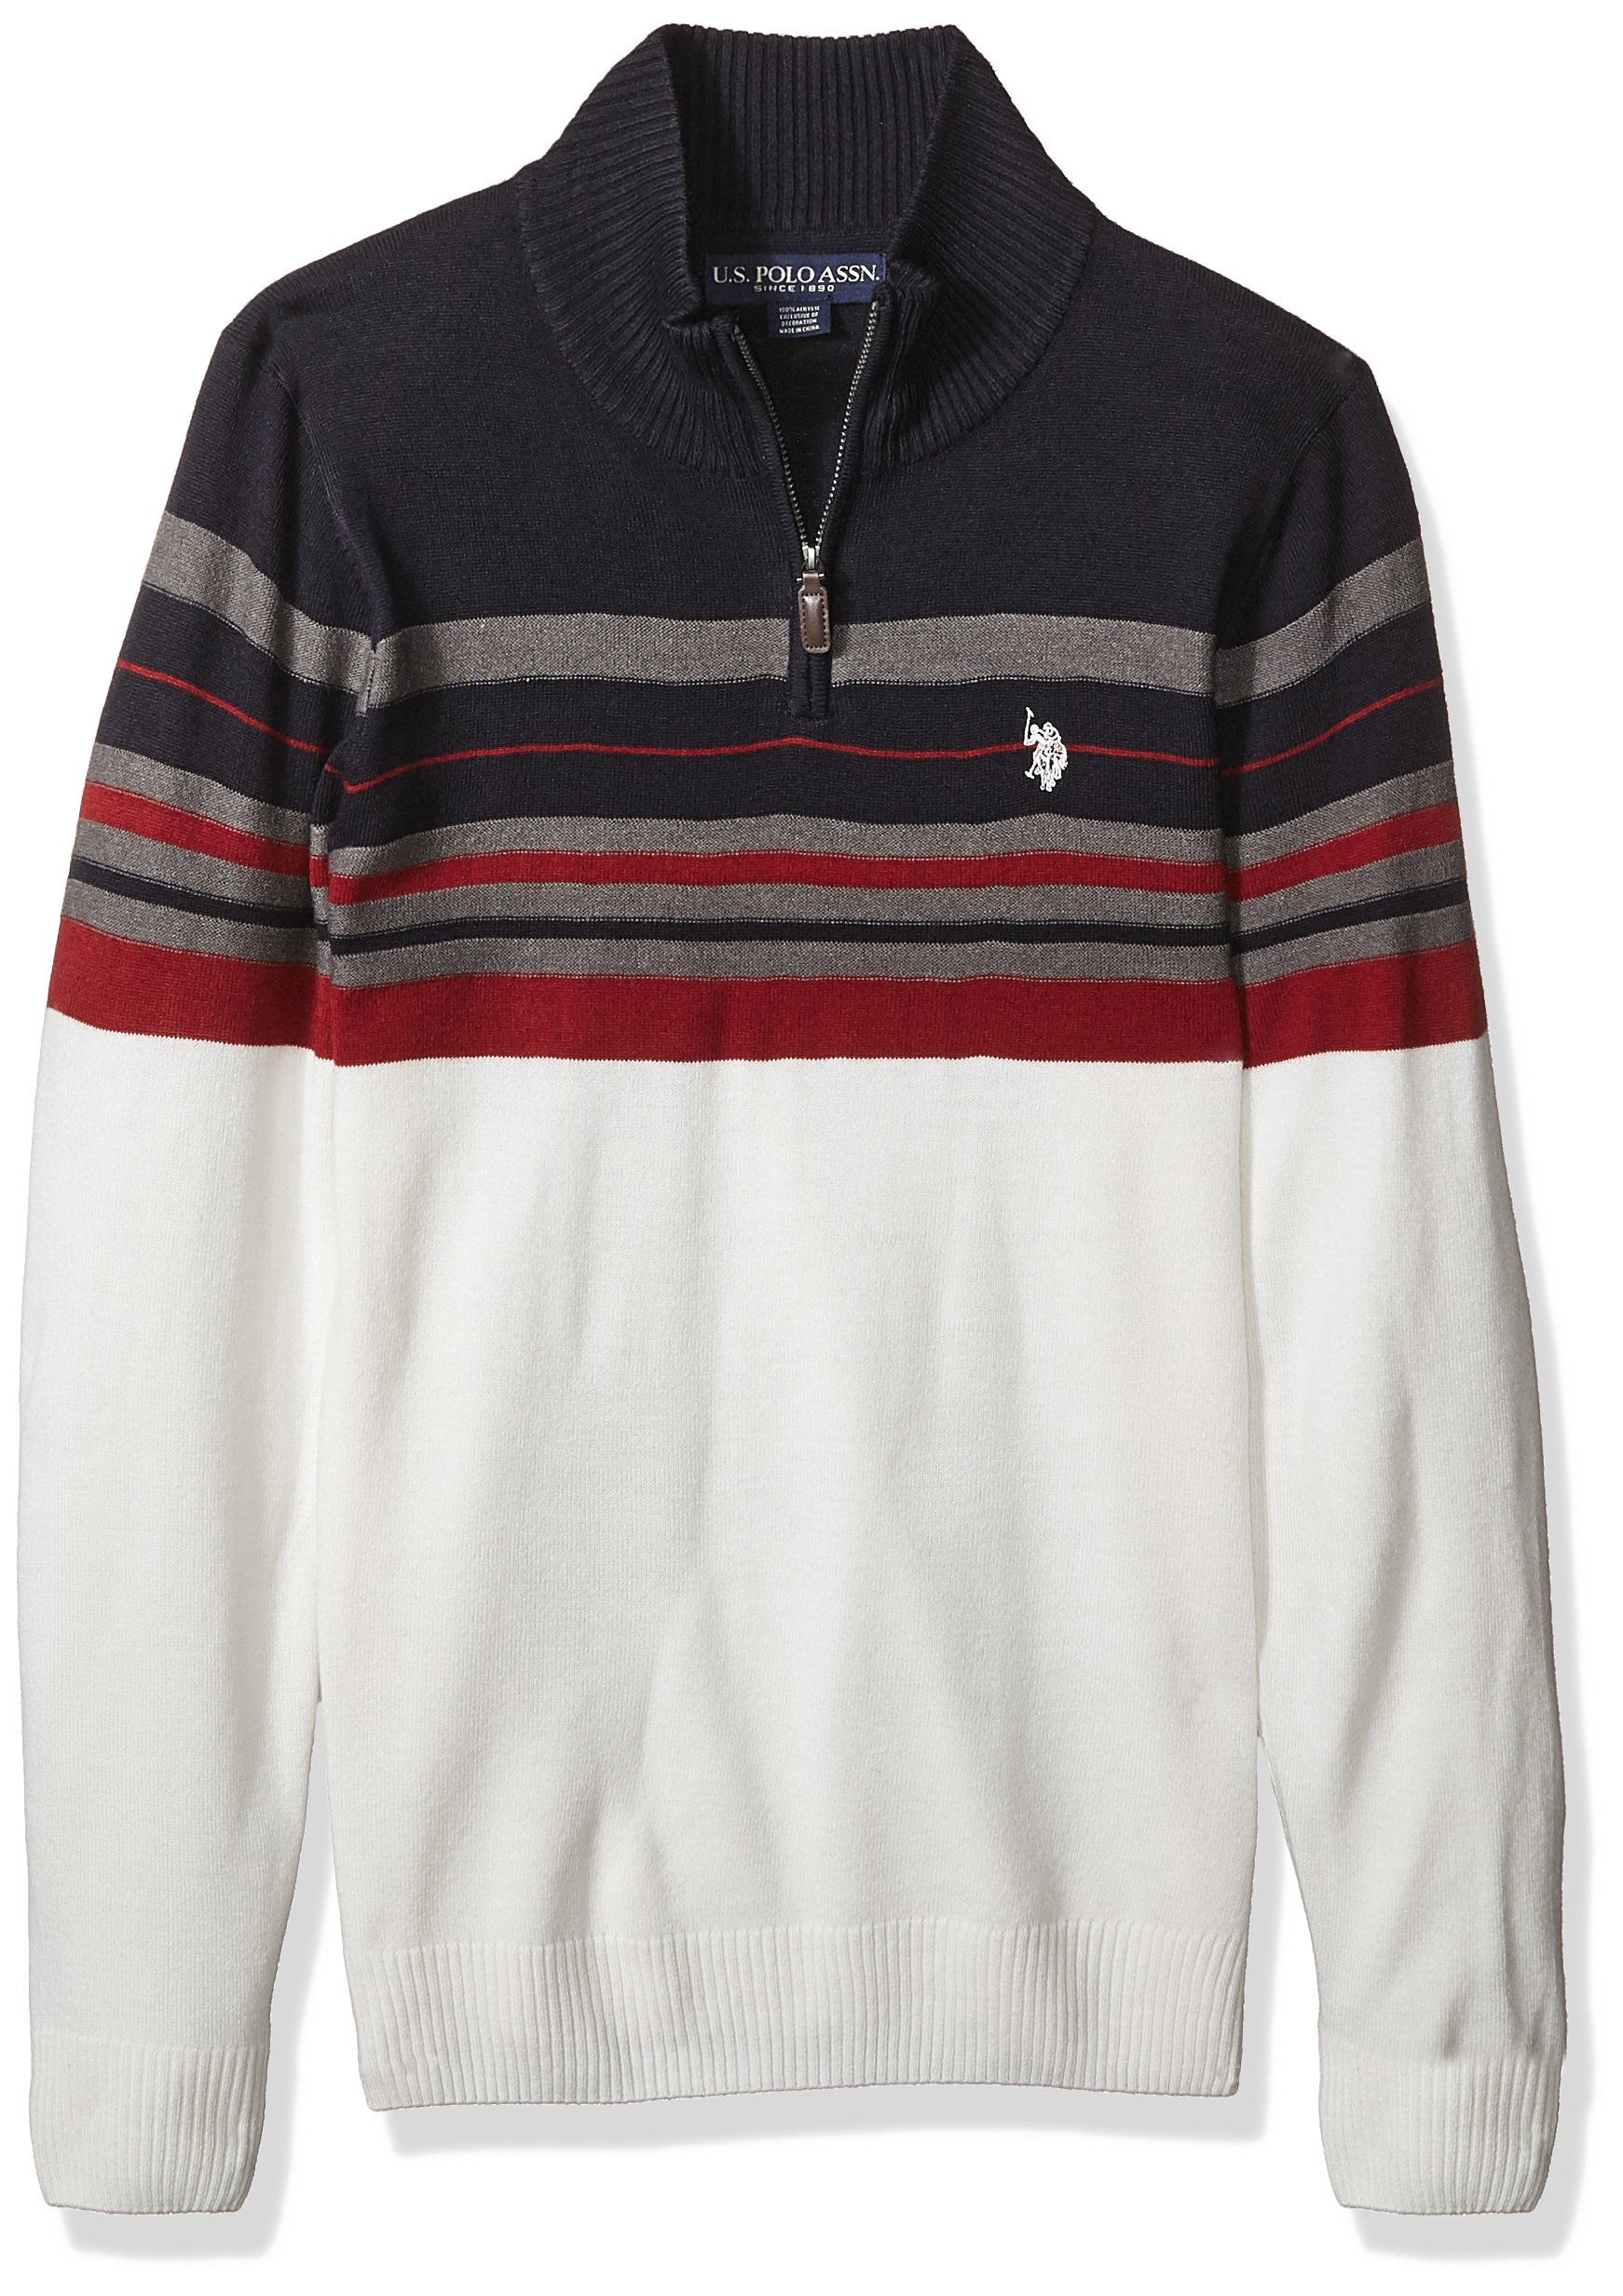 U.S. Polo Assn. Men's Multi Stripe 1/4 Zip Sweater, Navy, Medium